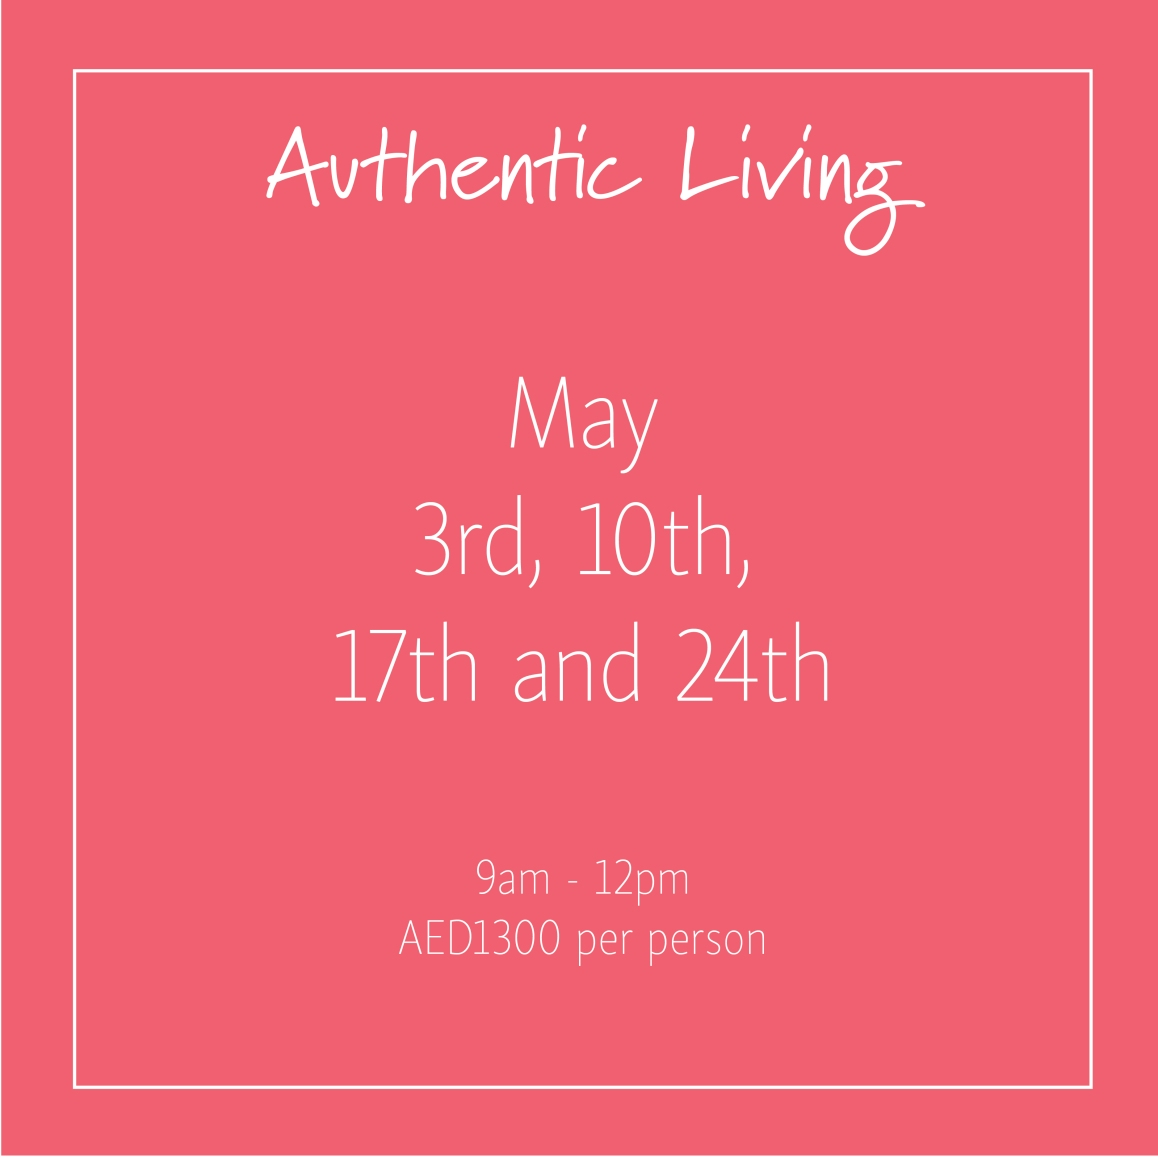 Authentic Living May_Social Media Art 1